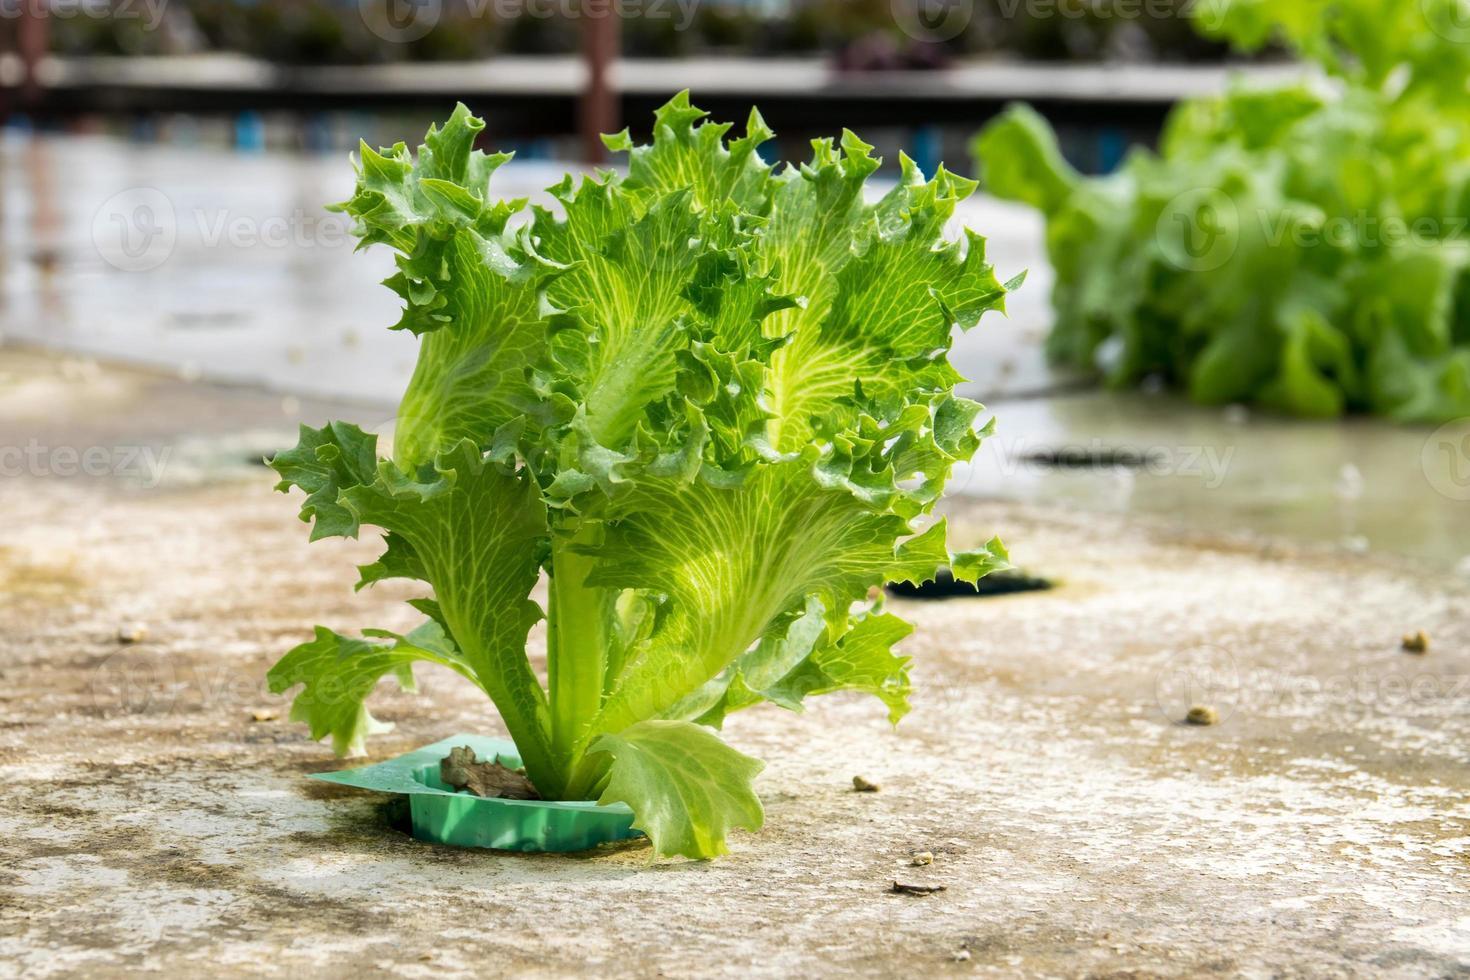 teelt hydrocultuur groene groente in boerderij foto